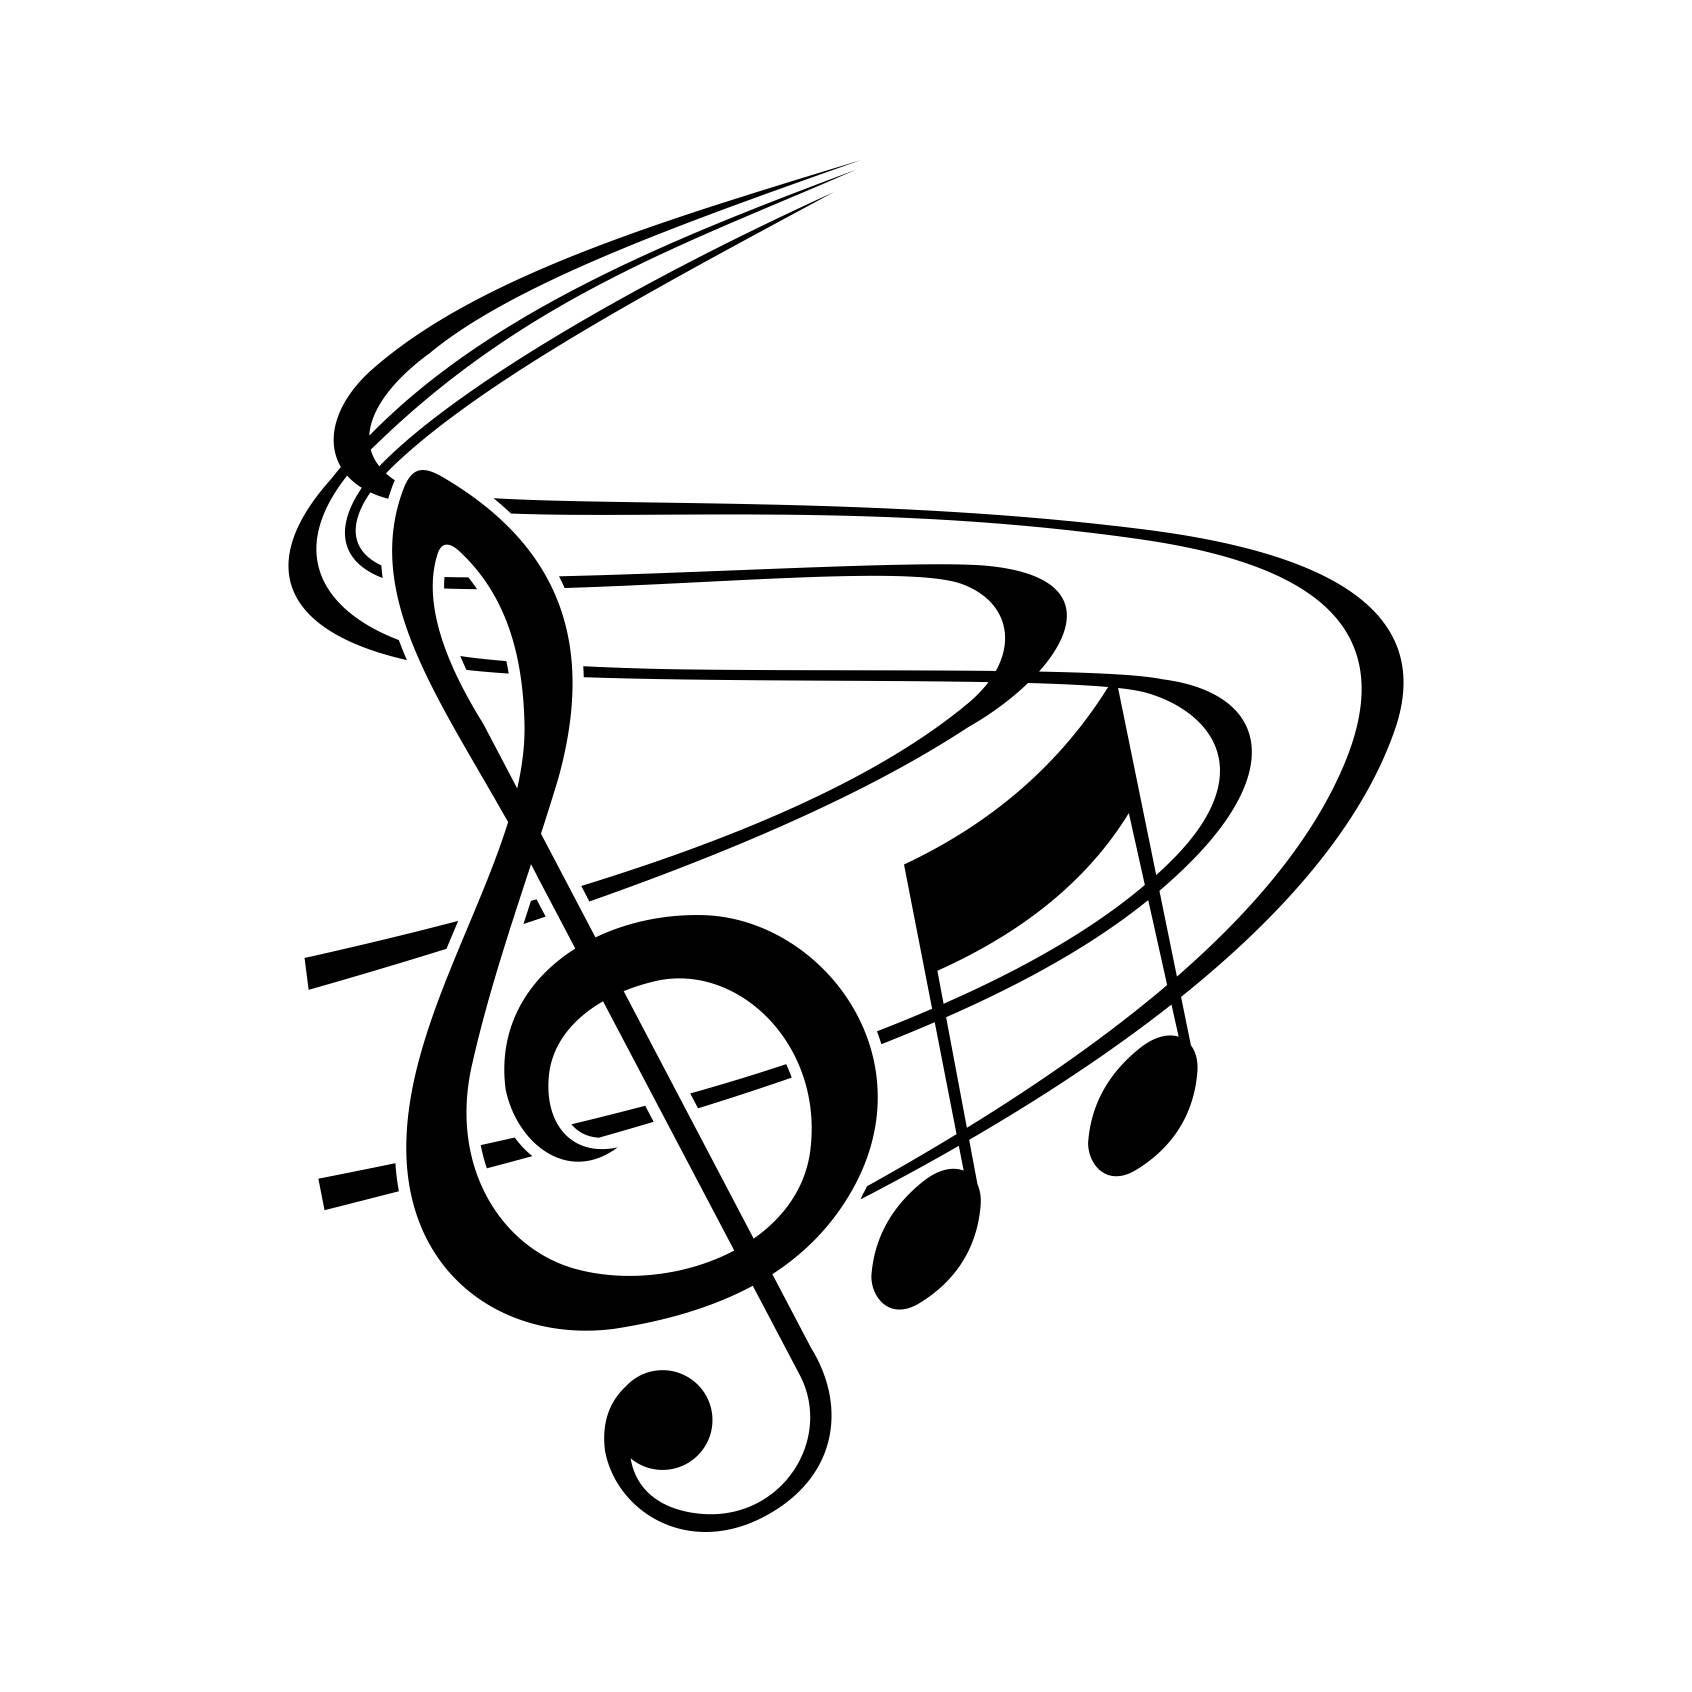 Whimsical treble clef clipart png graphic black and white stock Pin szerzője: Sülle Katalin, közzétéve itt: Music ekkor ... graphic black and white stock